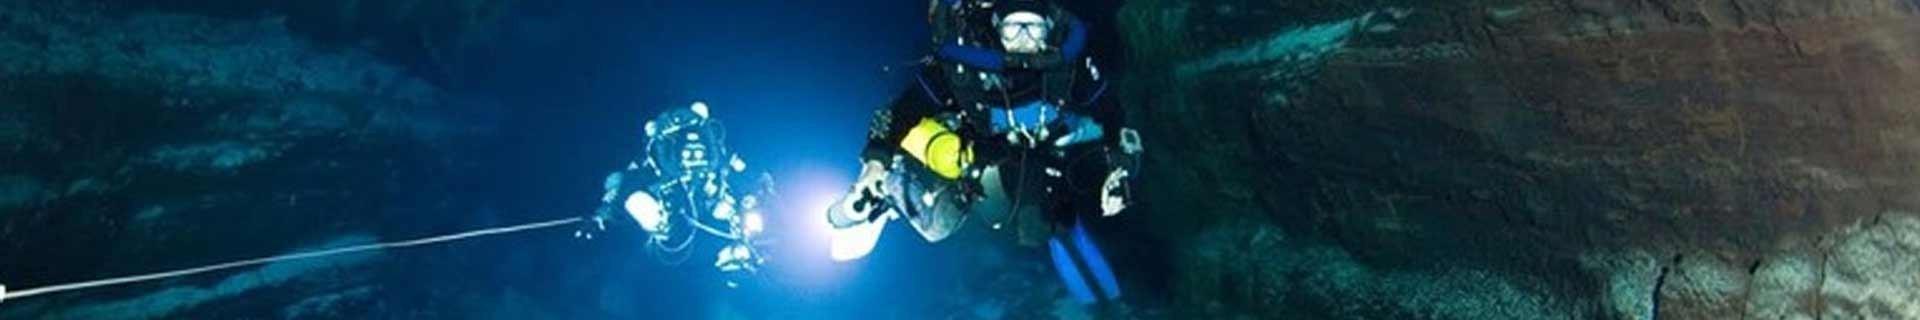 Matériel de plongée TEK